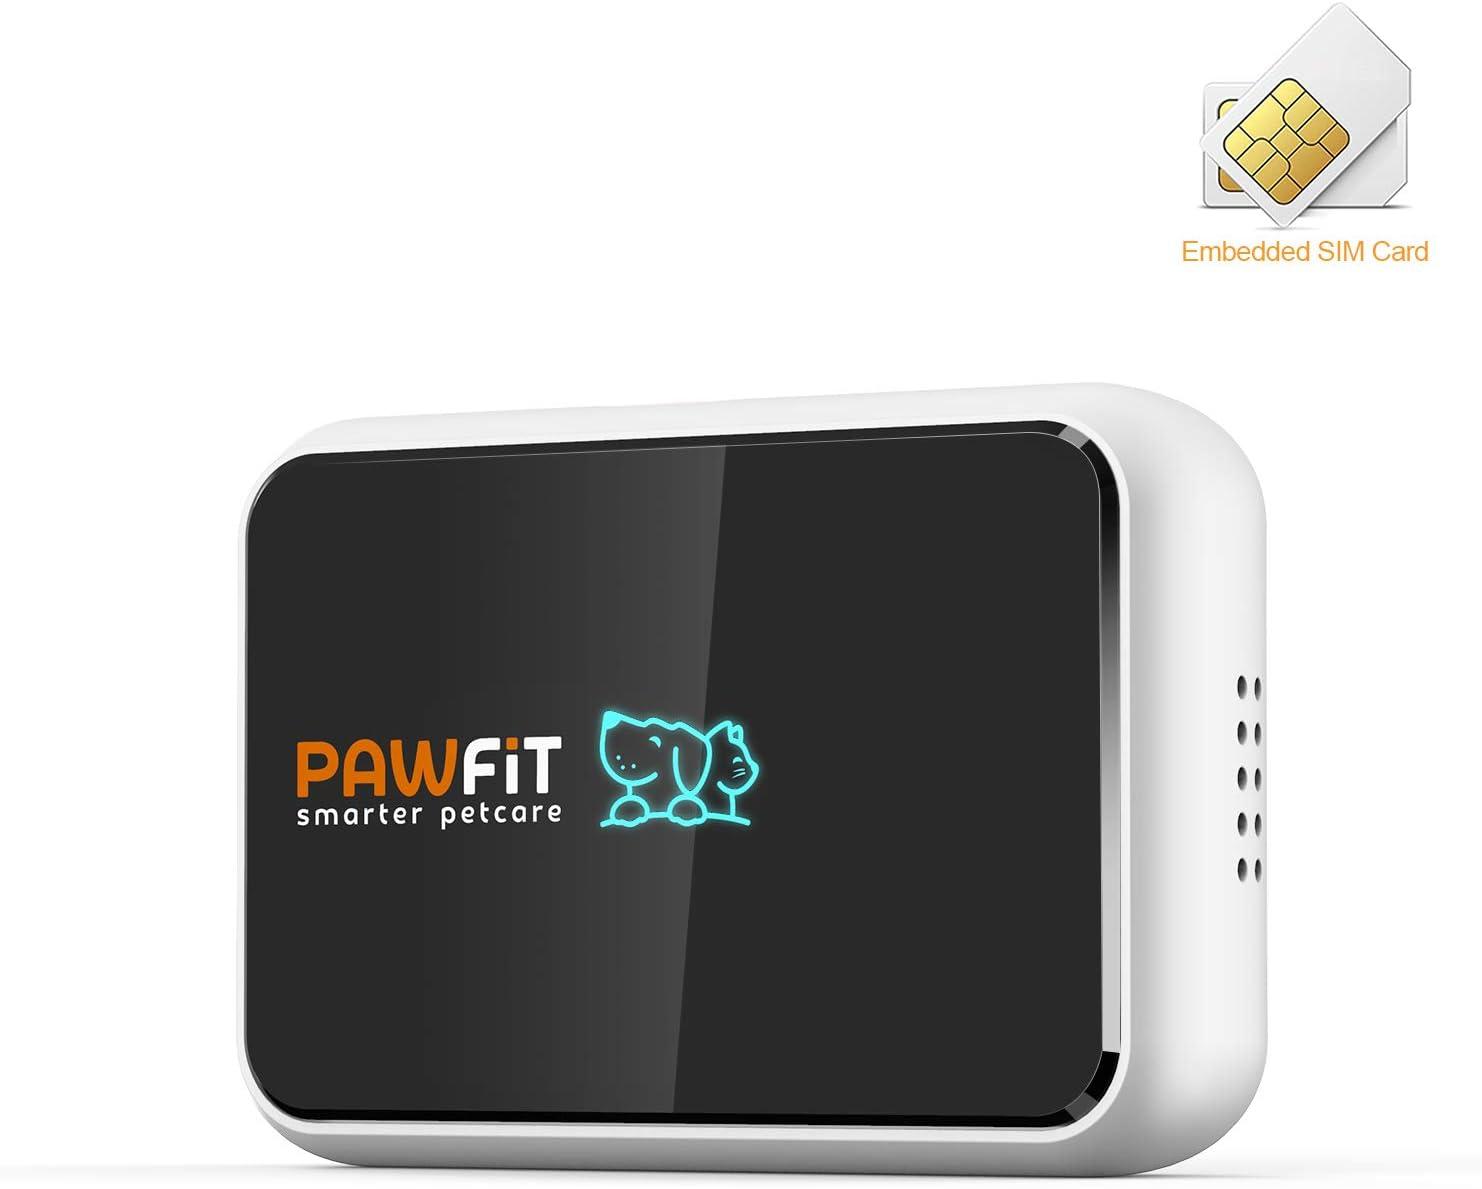 Pawfit 2